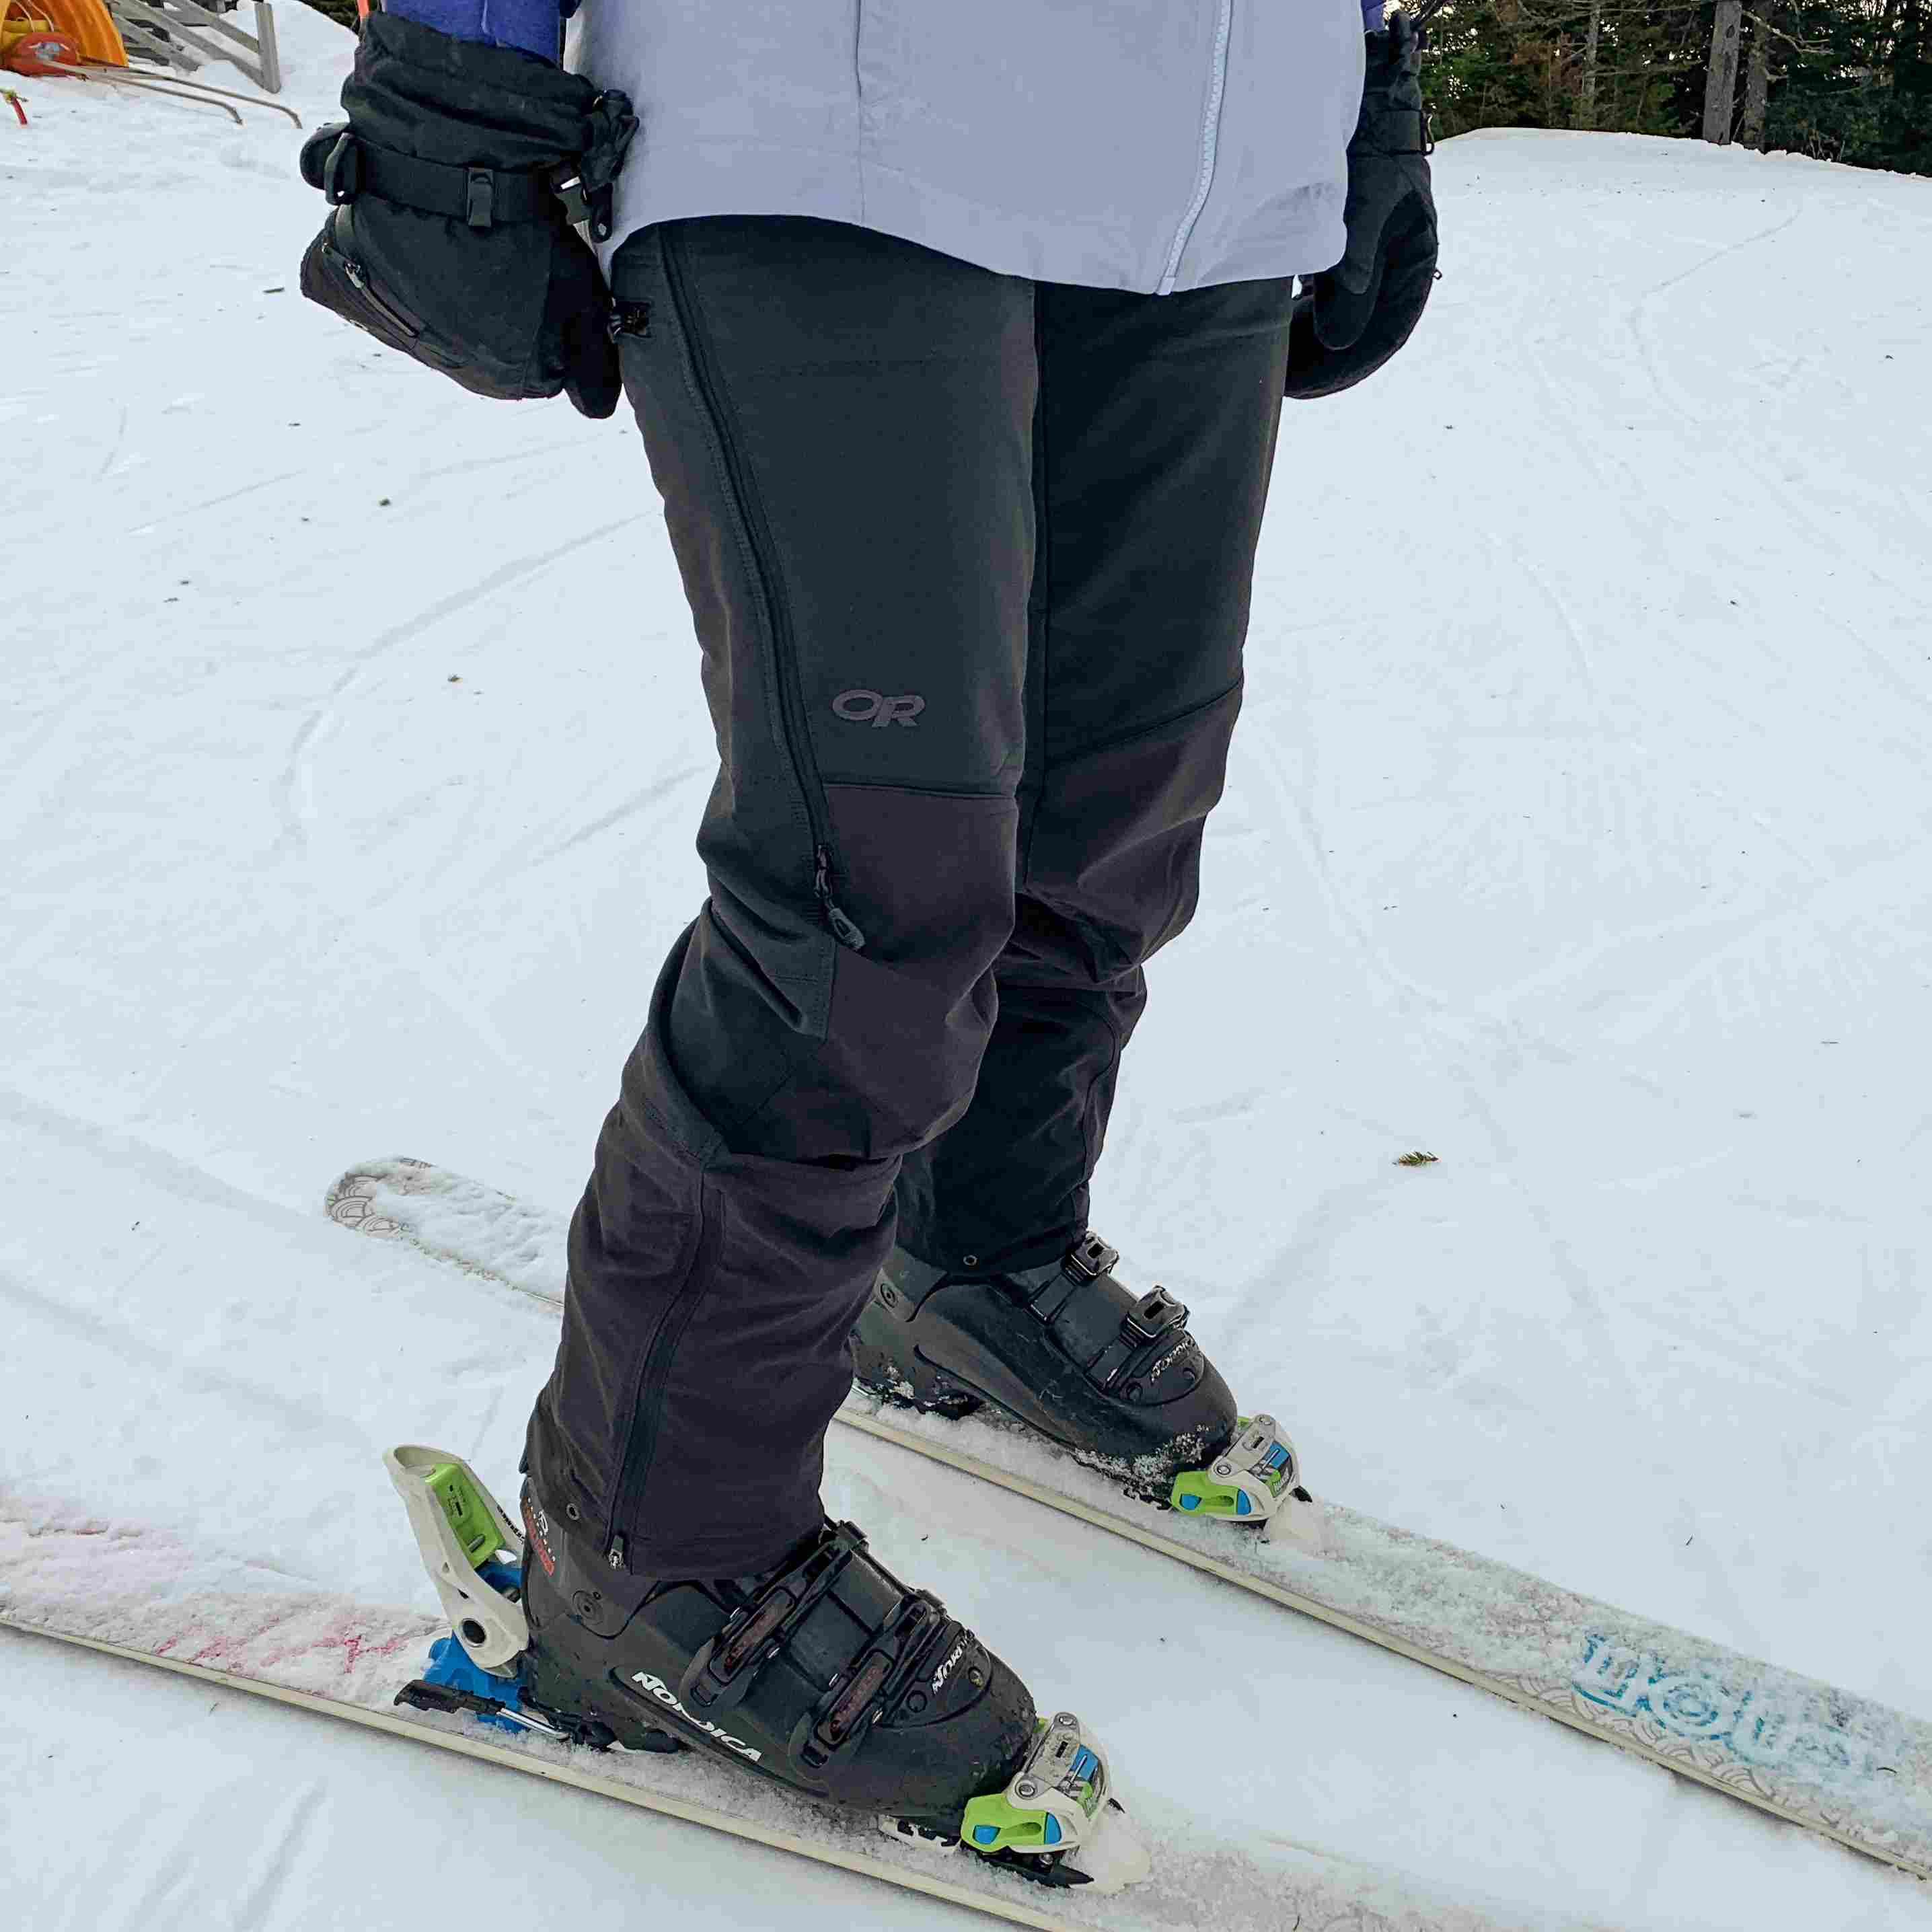 The 8 Best Women's Ski Pants of 2019